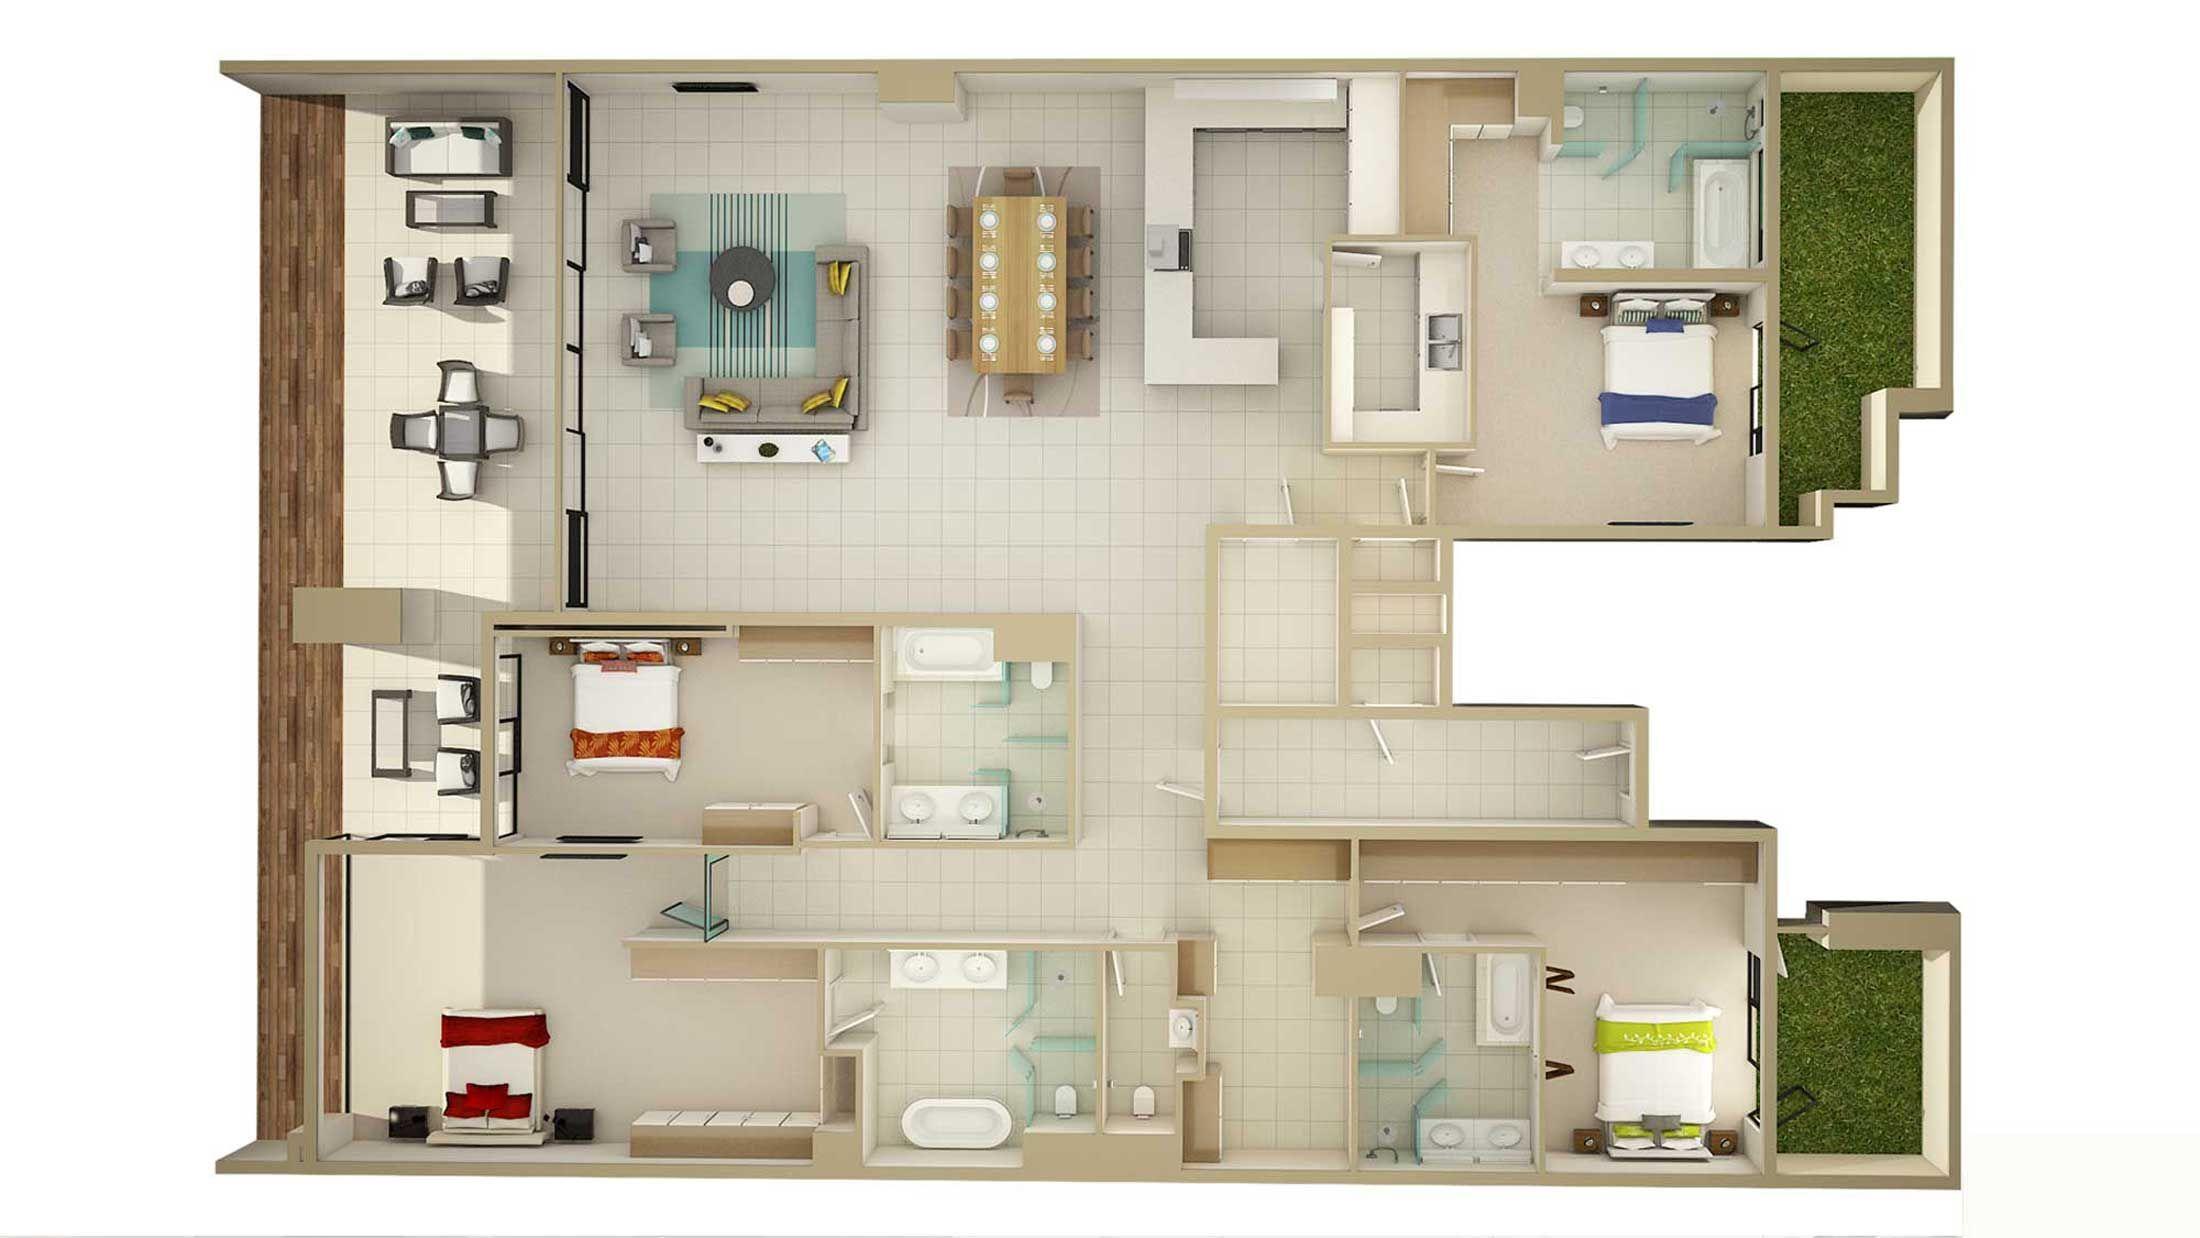 3d floor plan designer | rza | Pinterest | 3d house plans, Luxury ...